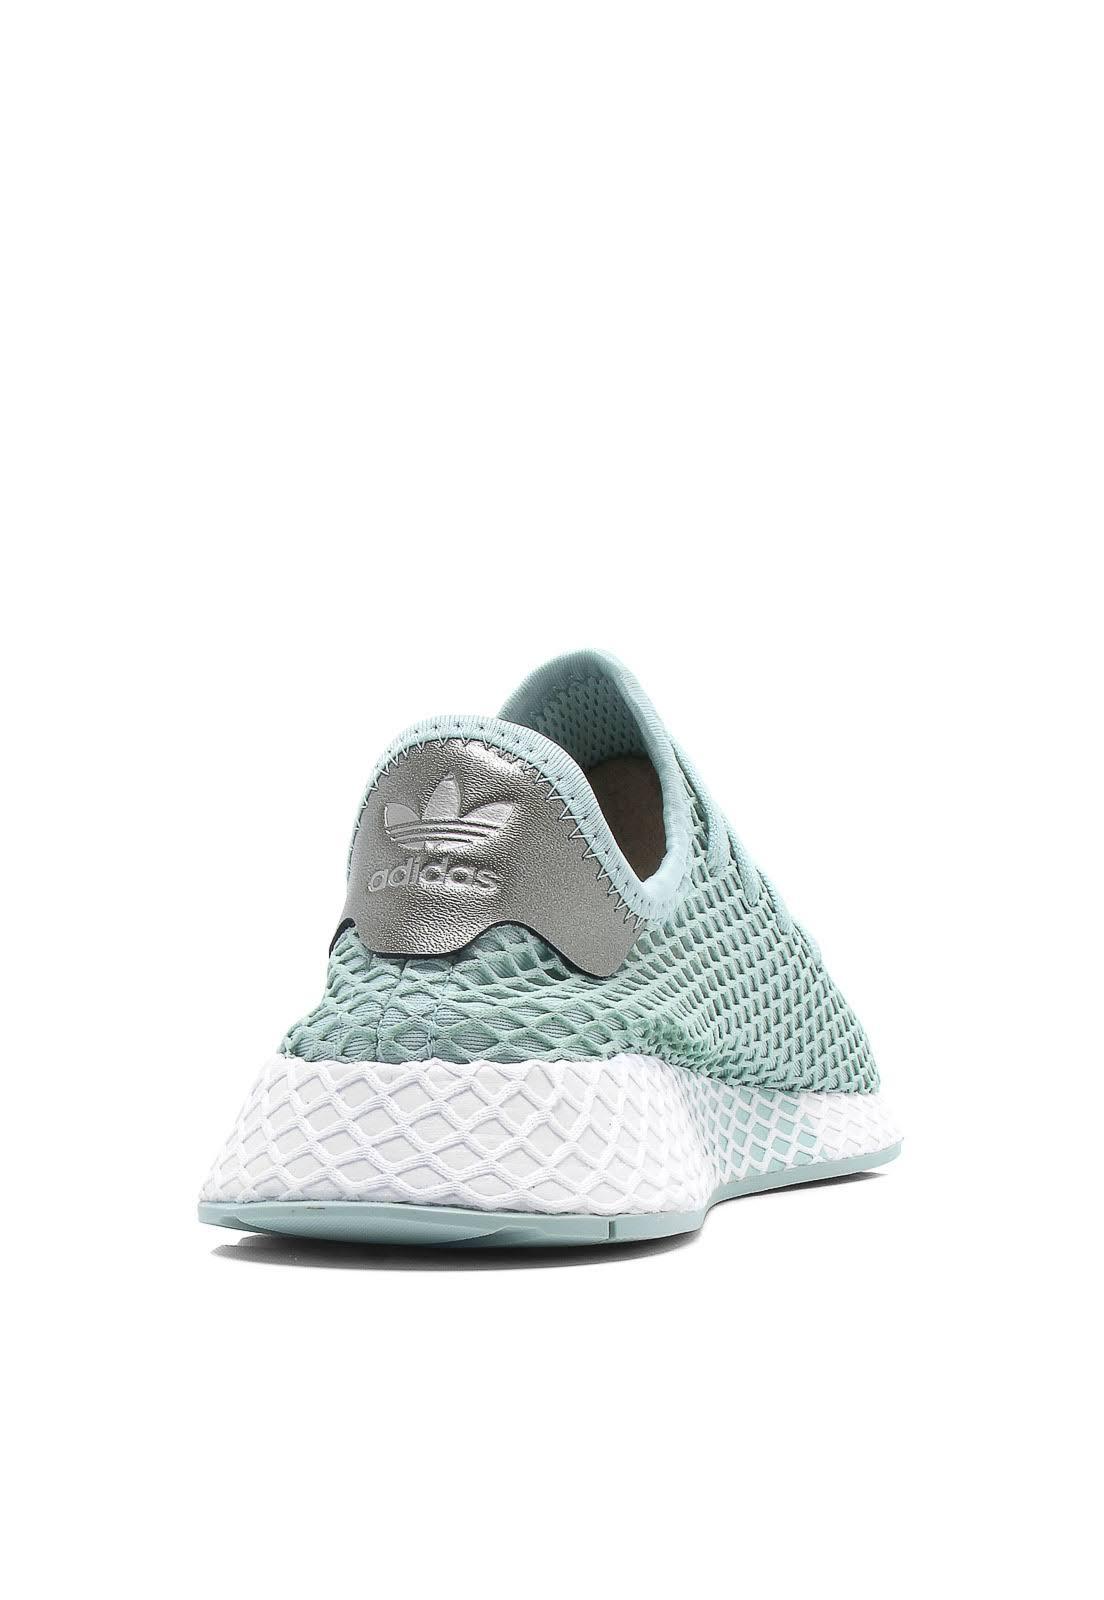 Deerupt Lifestyle Adidas Runner GroenDames Tennis 7mIb6gvYfy